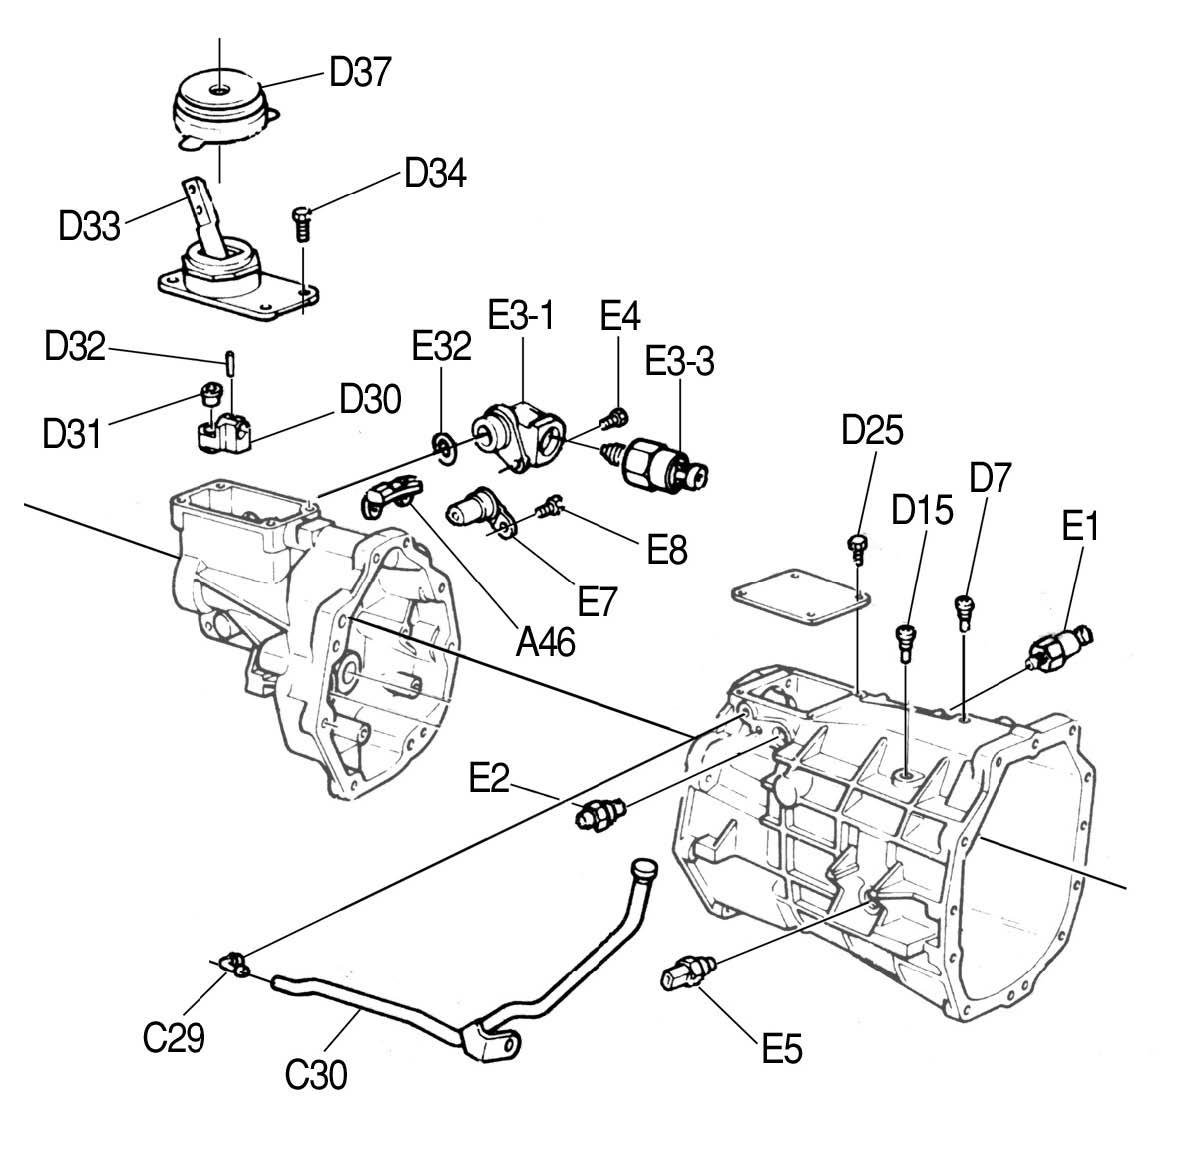 t56 reverse lockout solenoid wiring diagram